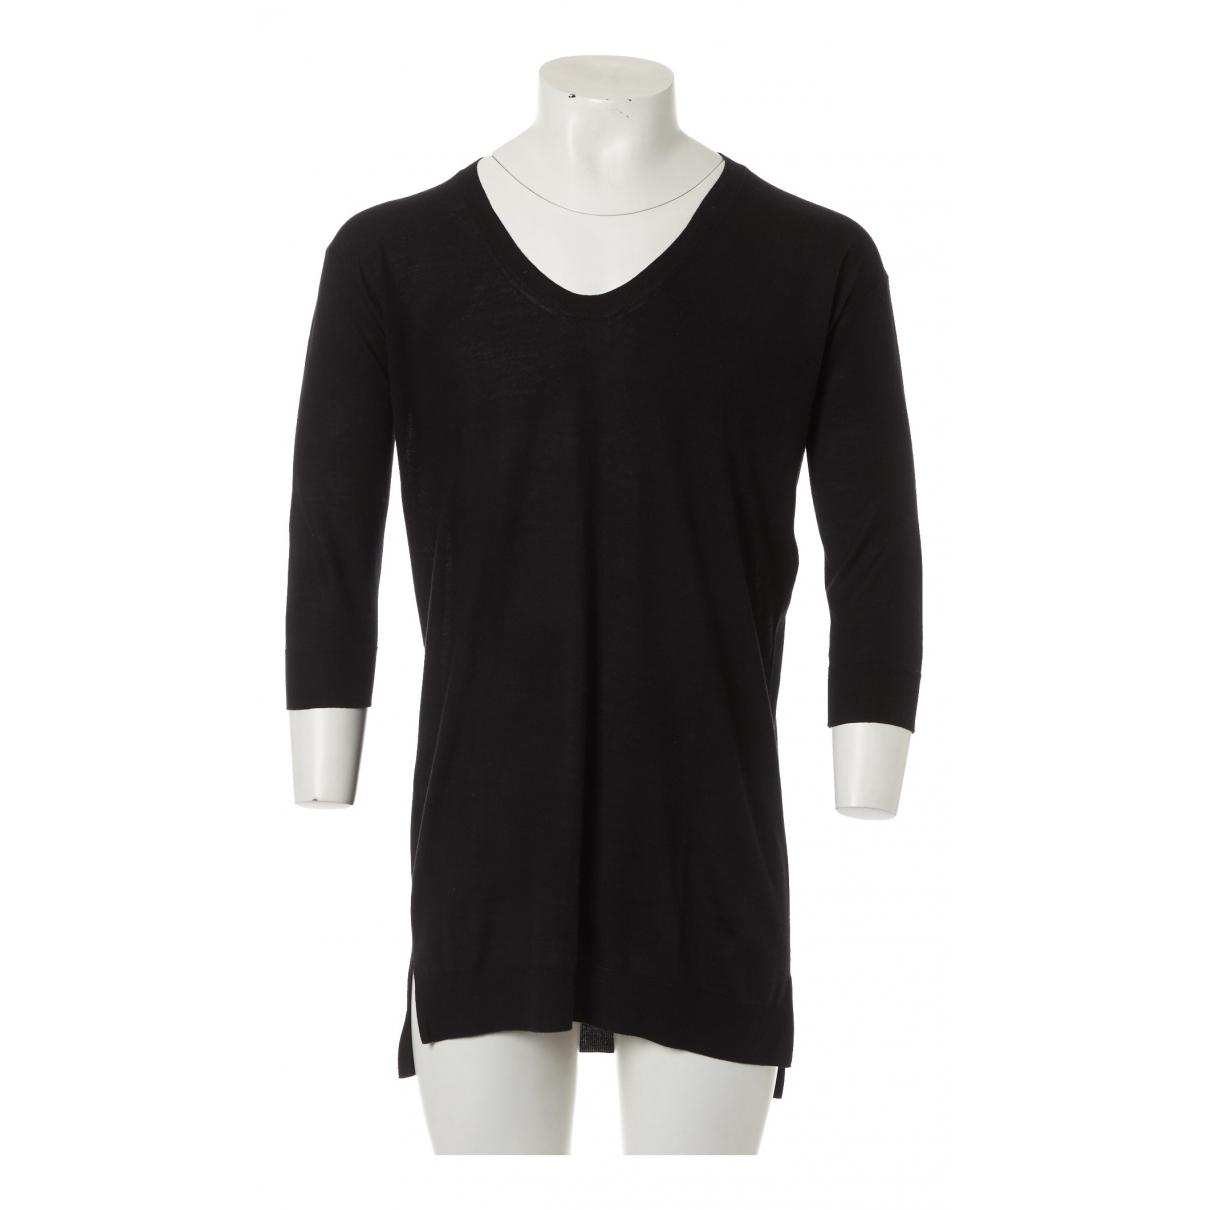 Louis Vuitton \N Black Cashmere dress for Women XS International